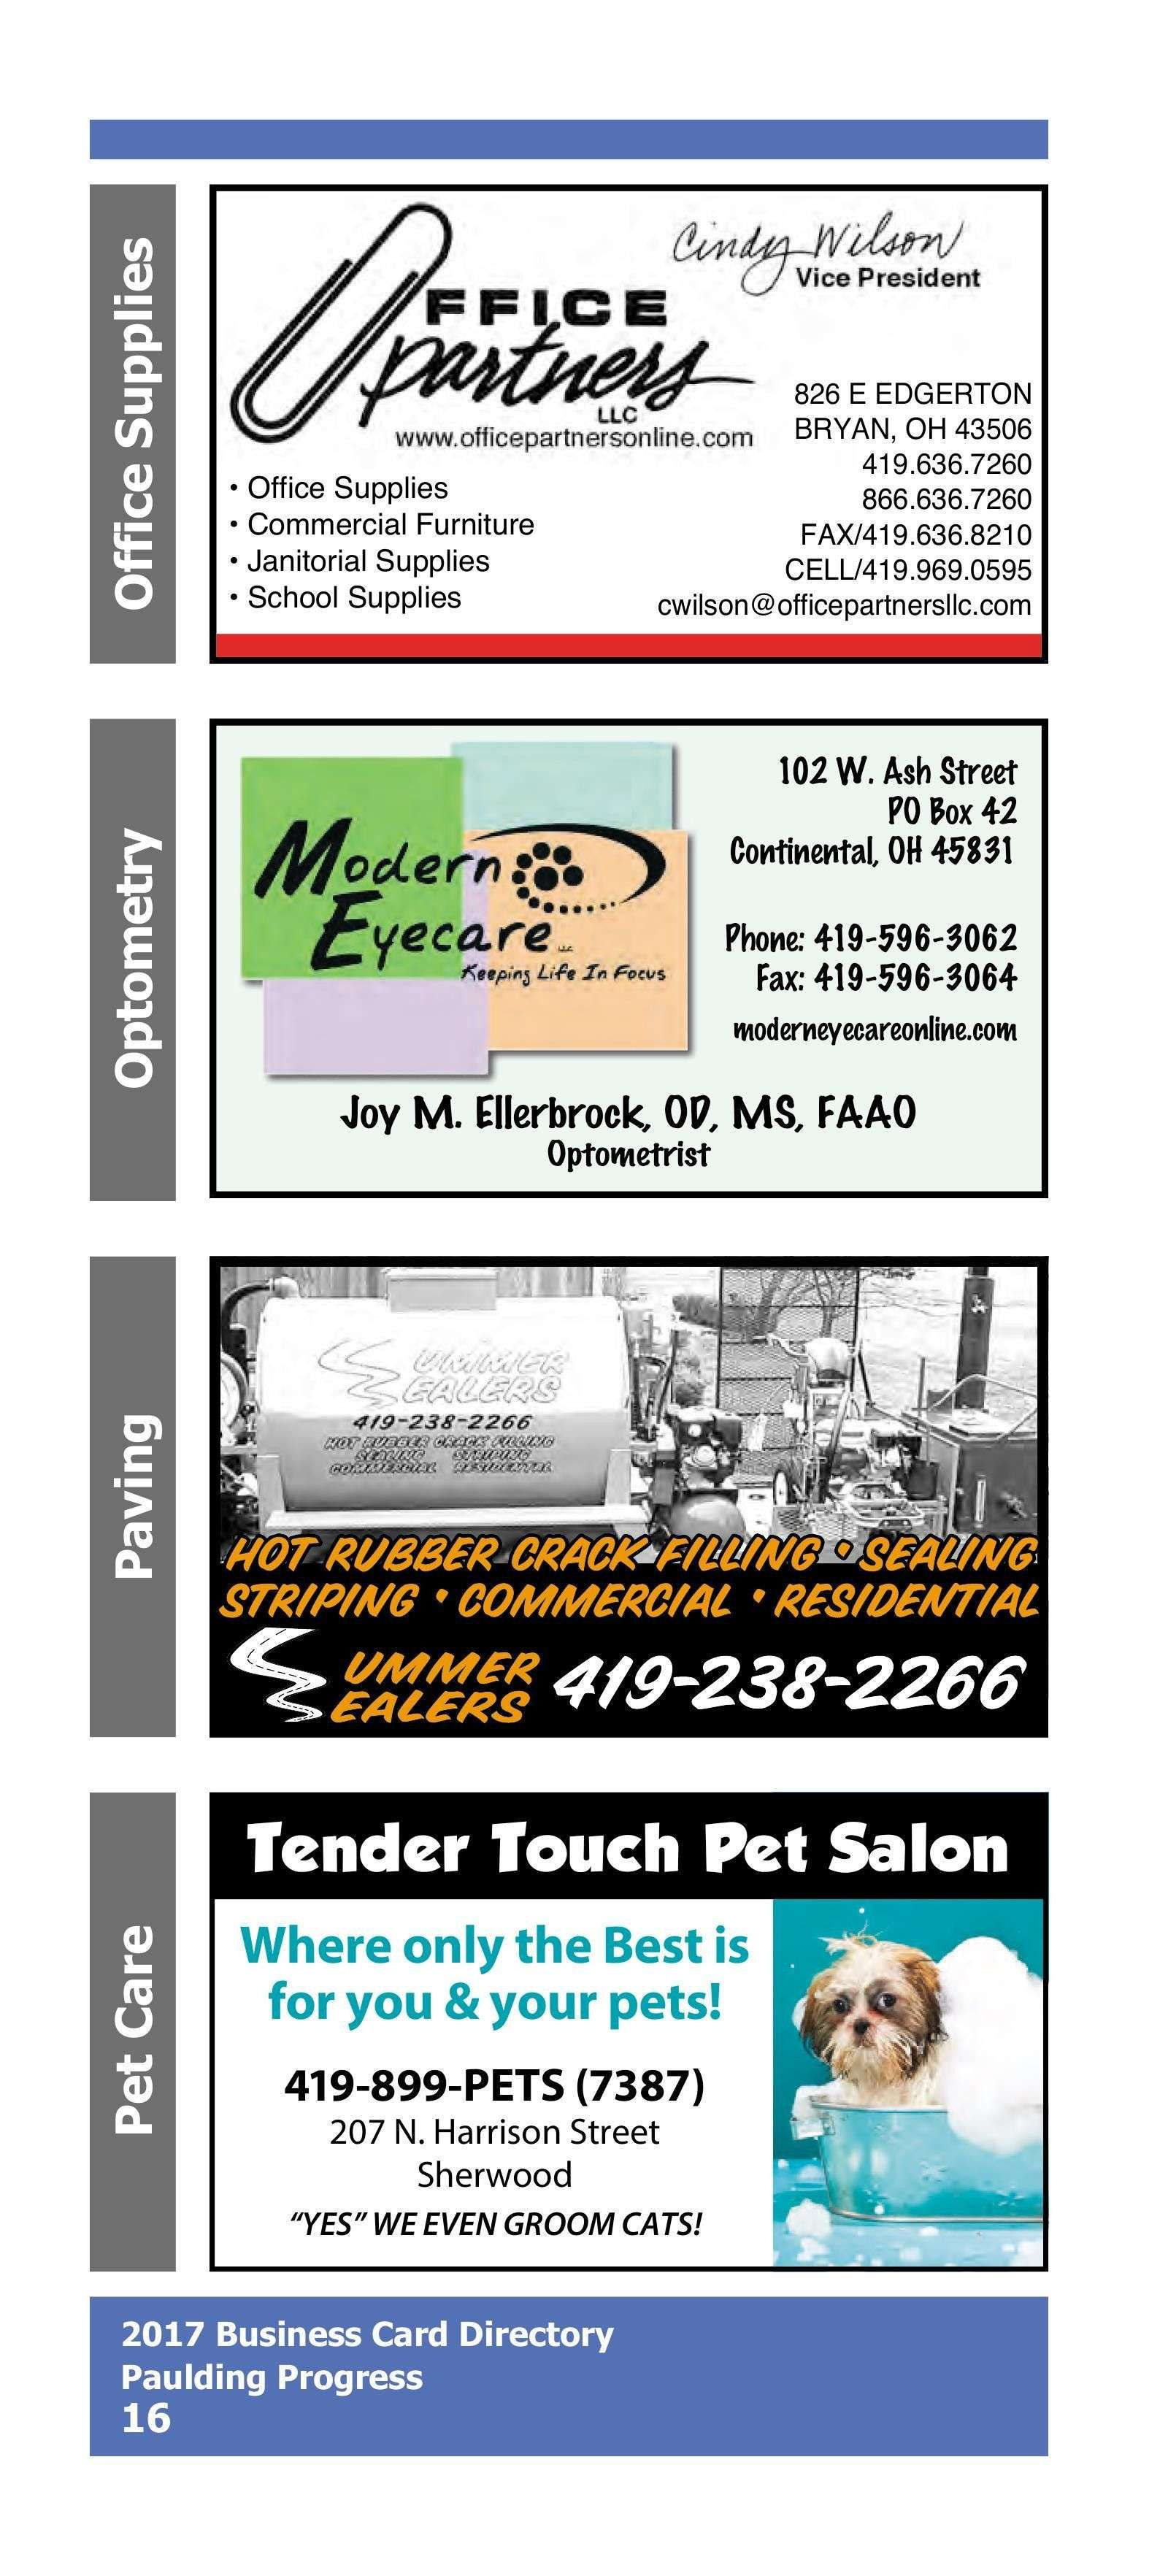 20 Hair Stylist Business Cards Templates 30 Beautiful Cool Hair Stylist Business Cards Hairstylist Business Cards Salon Business Cards Stylist Business Cards